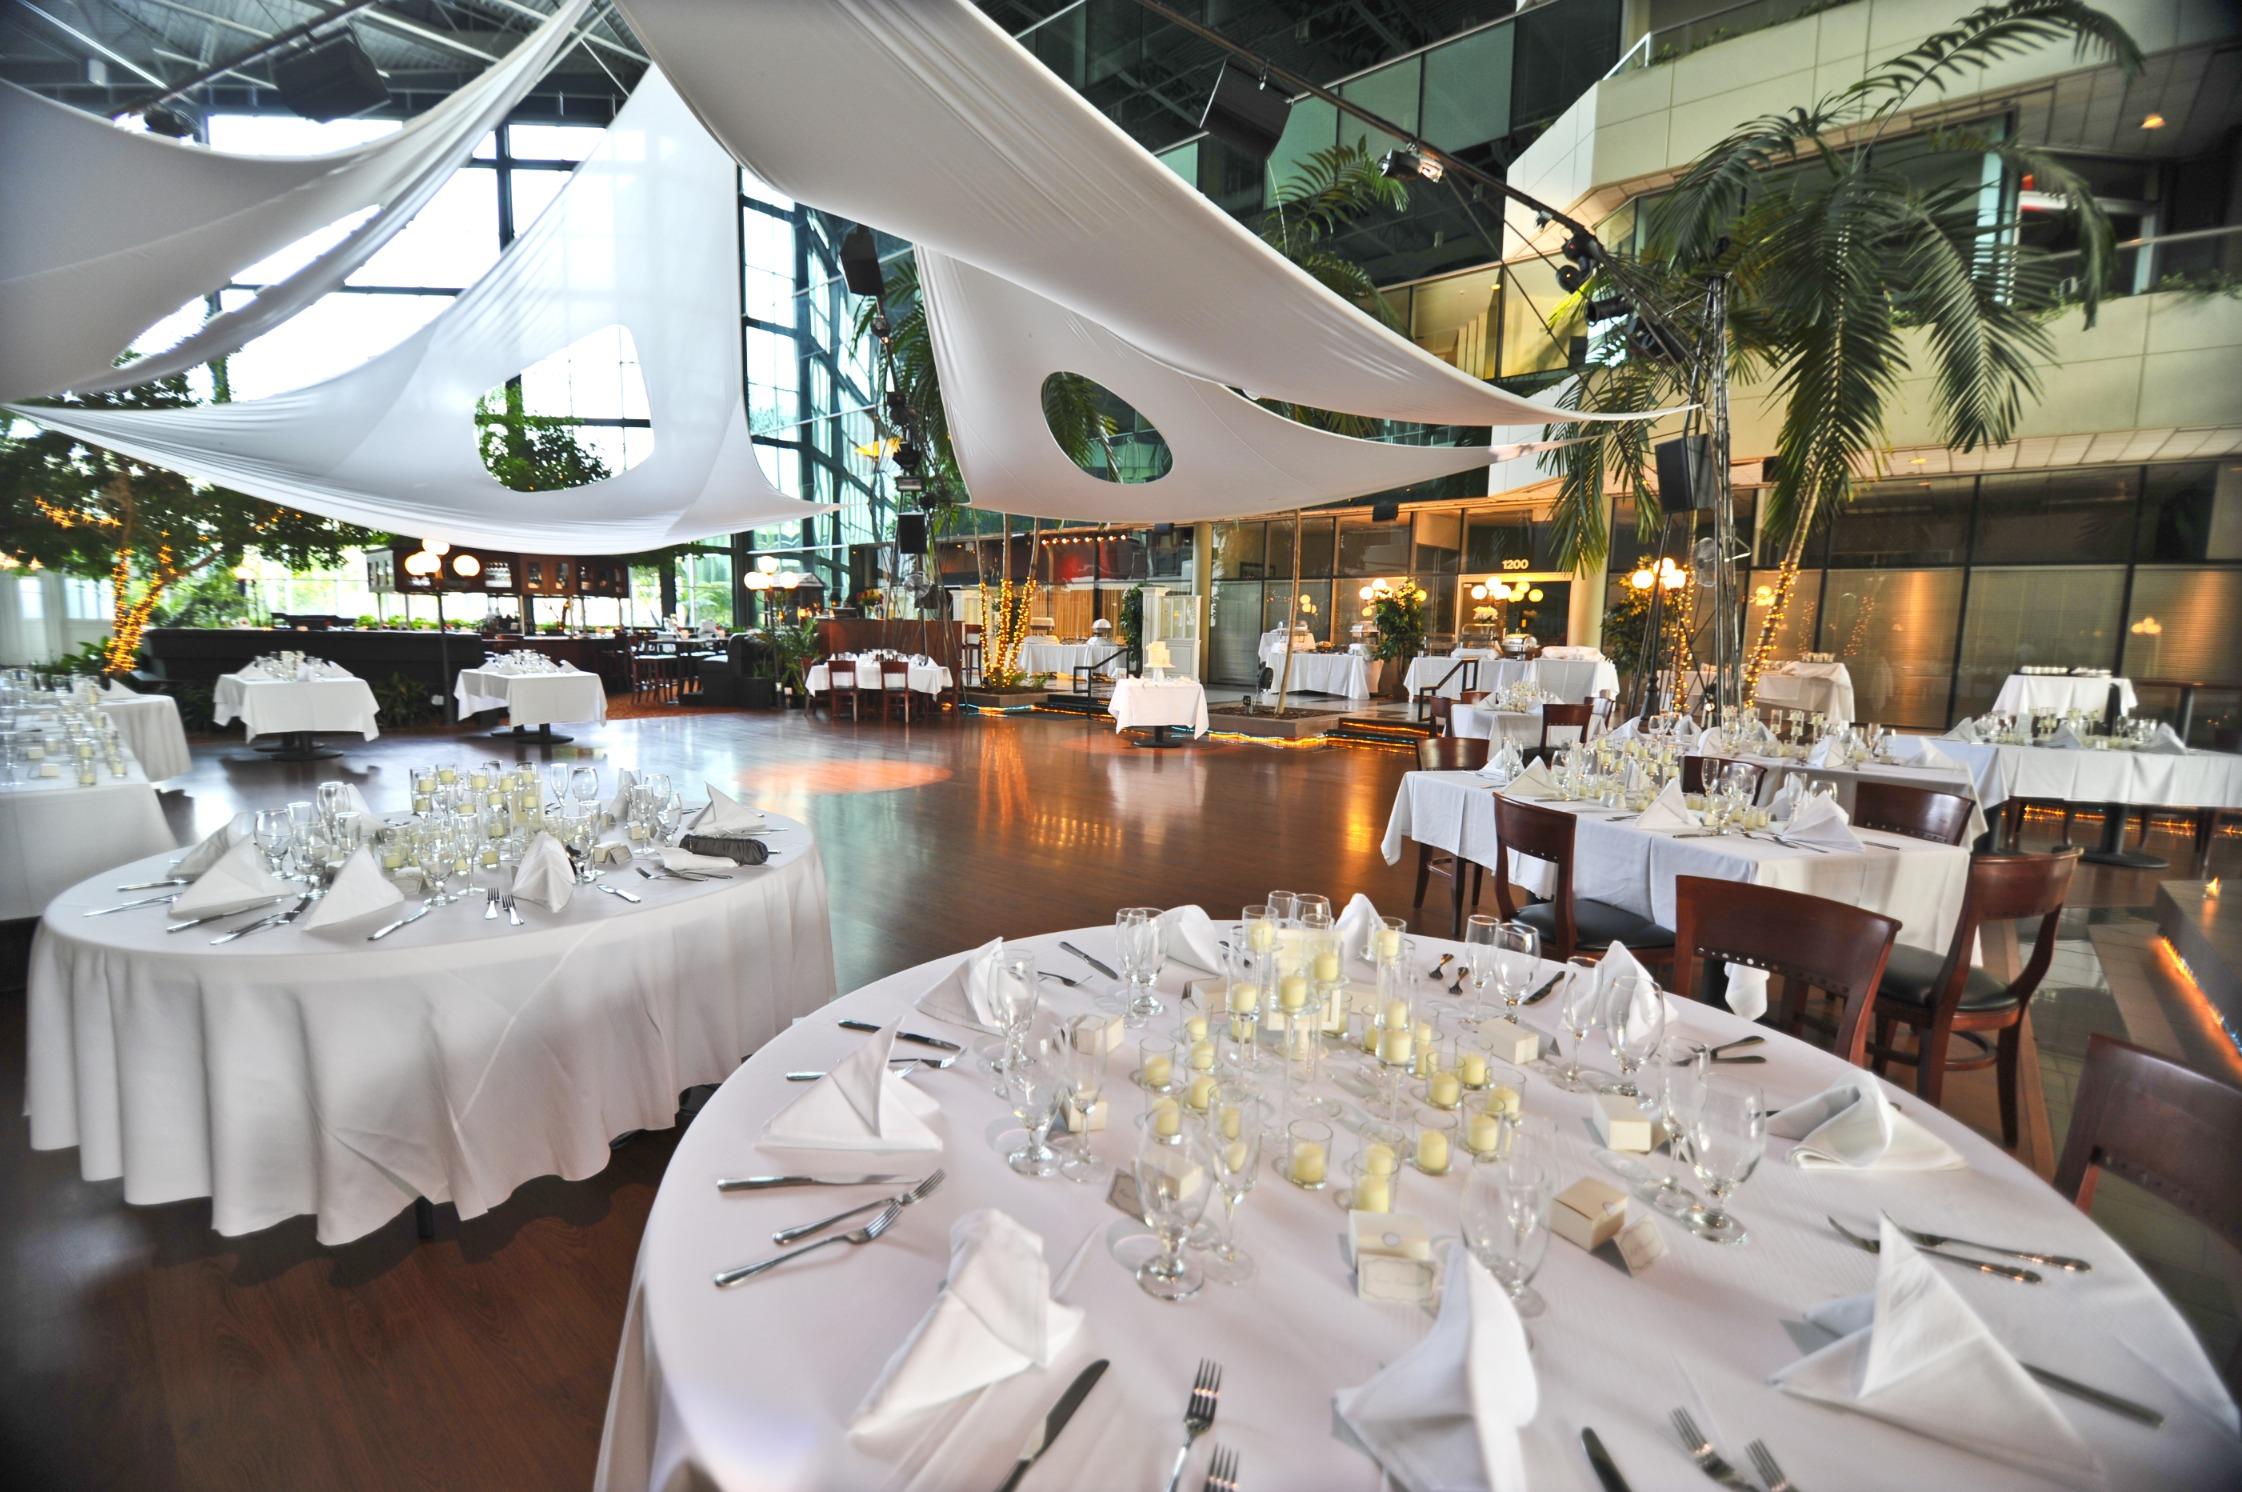 Pavilion Grille Wedding Venue In South Florida Partyspace